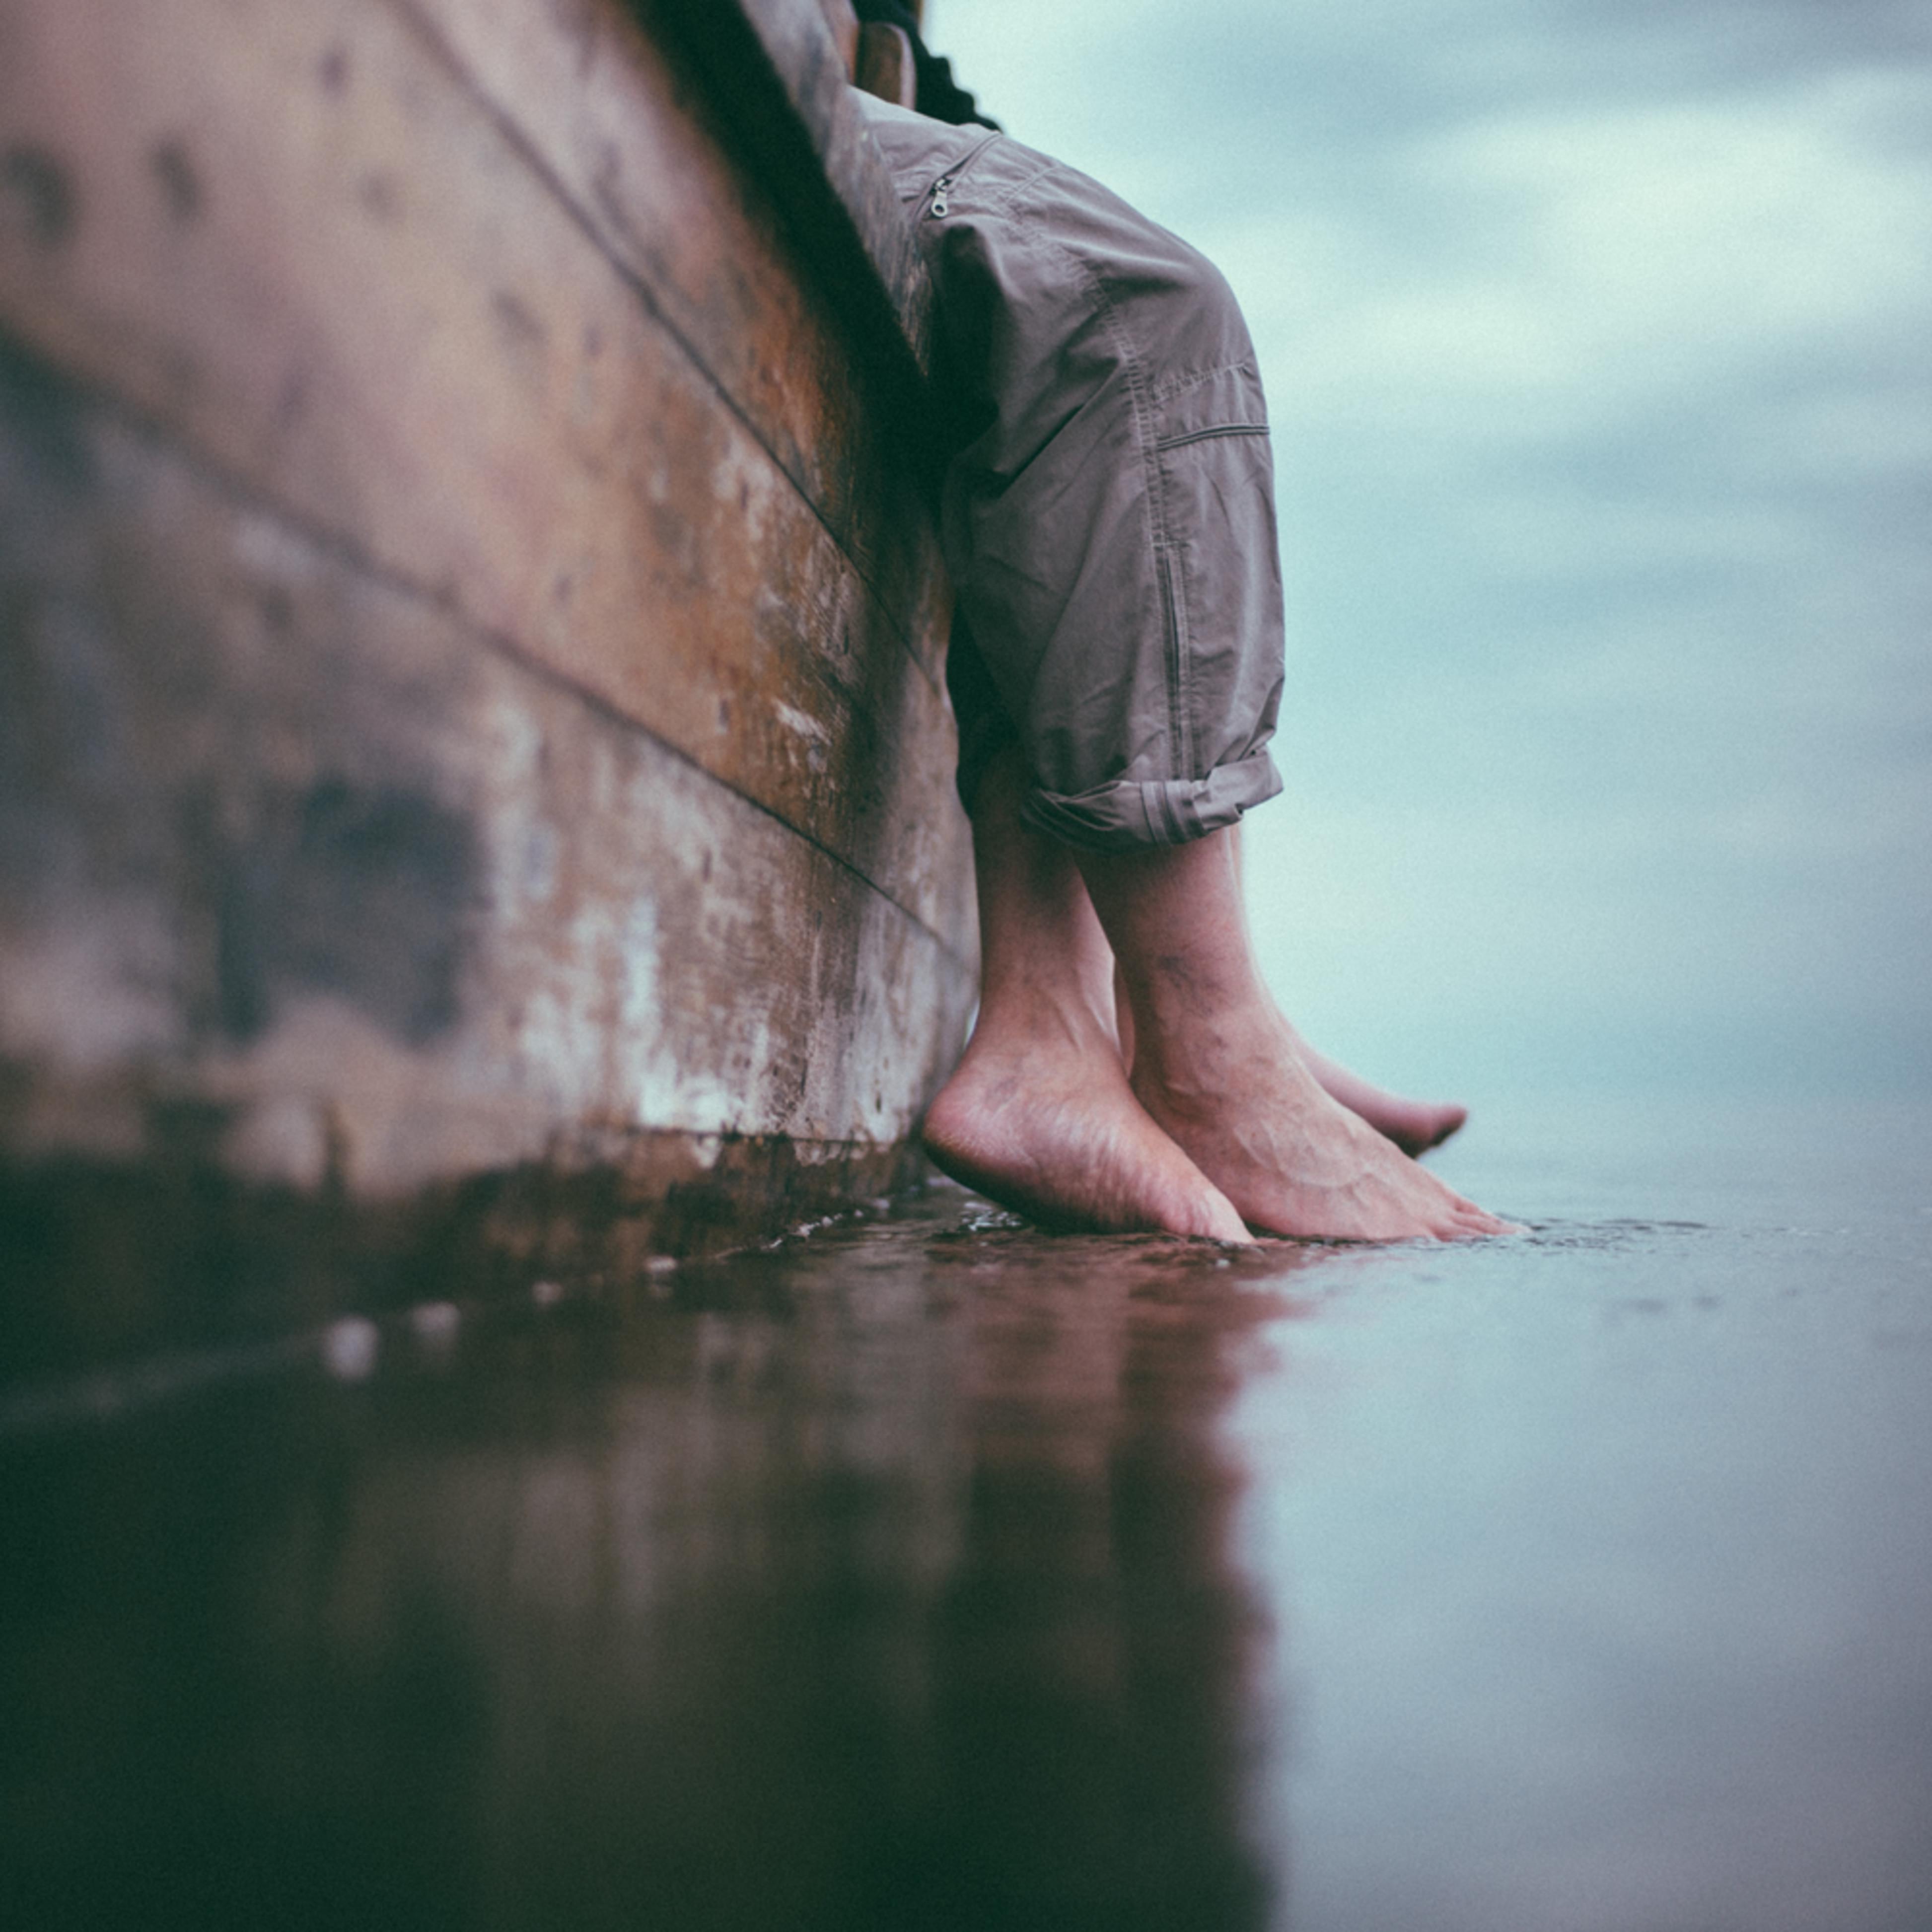 Voyage to realization dnffms